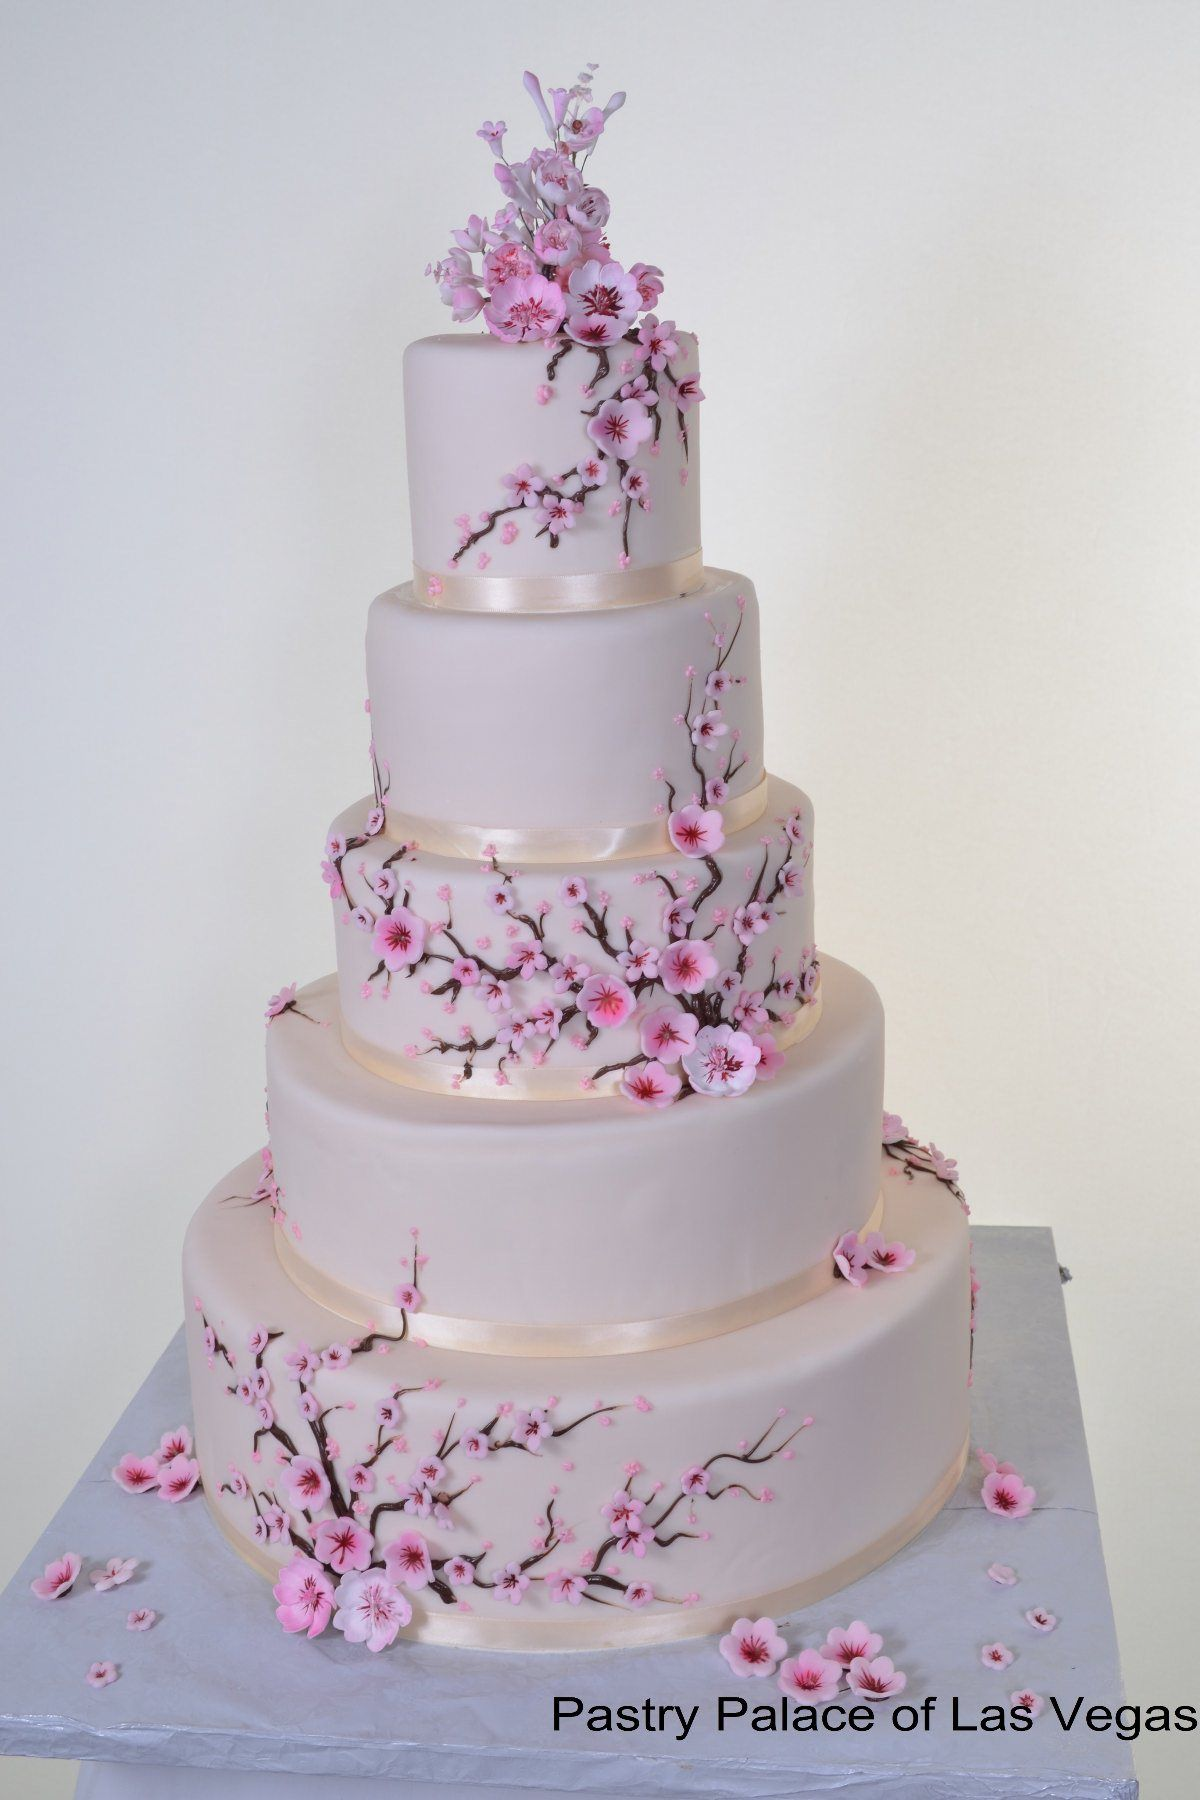 Beautiful Cherry Blossom Wedding Cake Vegas Wedding Cakes Cherry Blossom Cake Cherry Blossom Wedding Cake